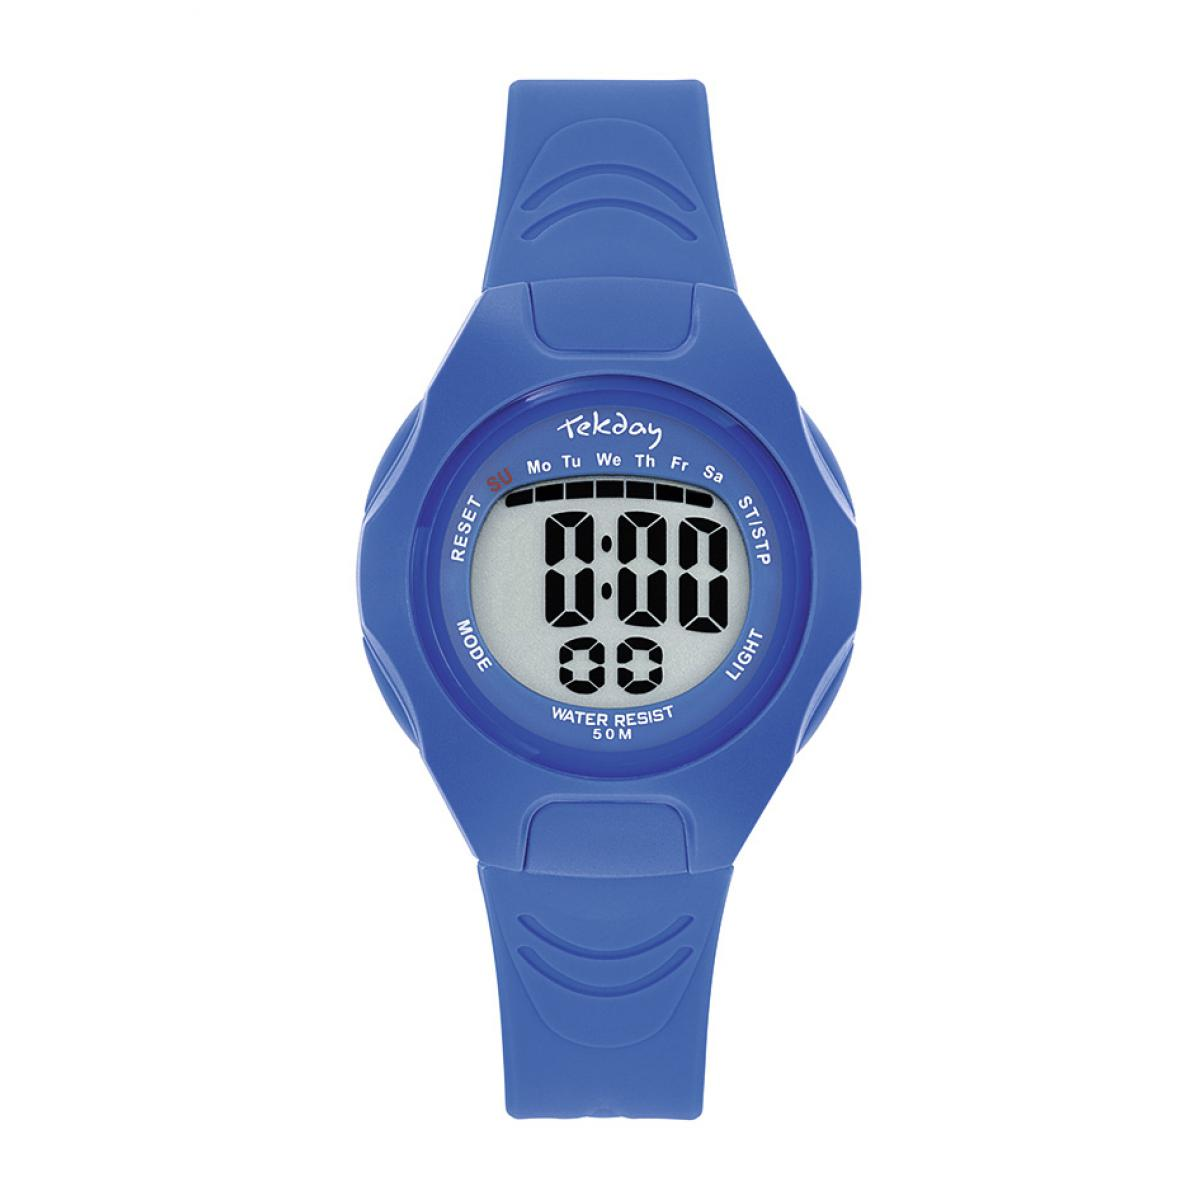 Montre 654664 - Bracelet Silicone Bleu Boitier Silicone Bleu - Tekday - Modalova